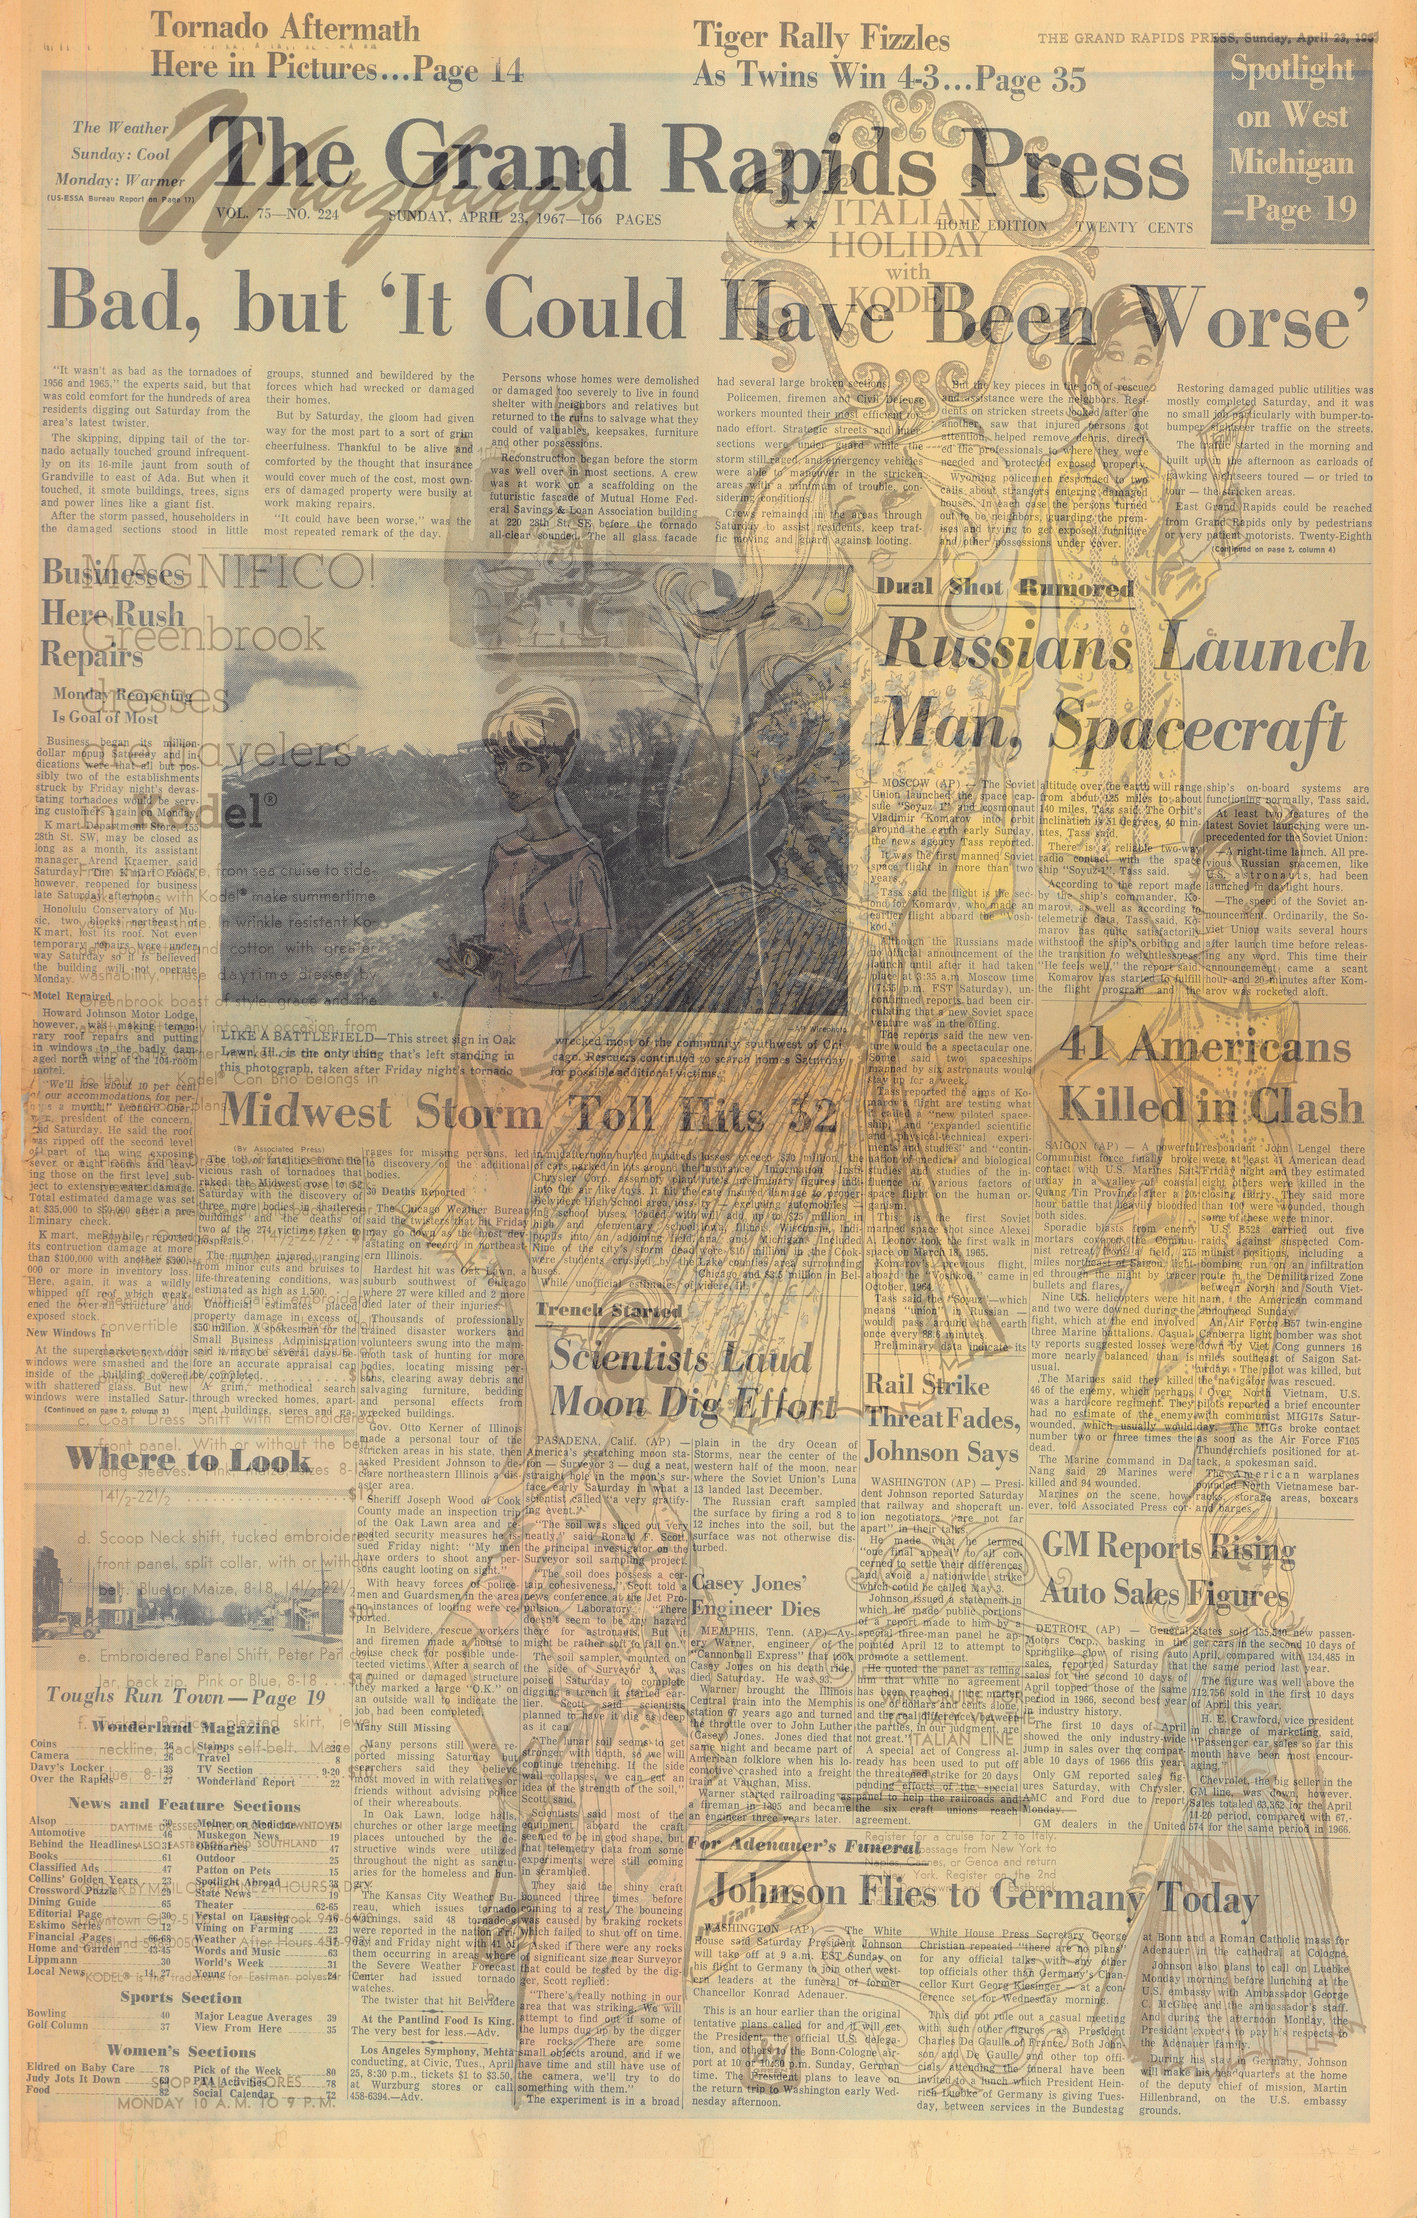 April 23, 1967